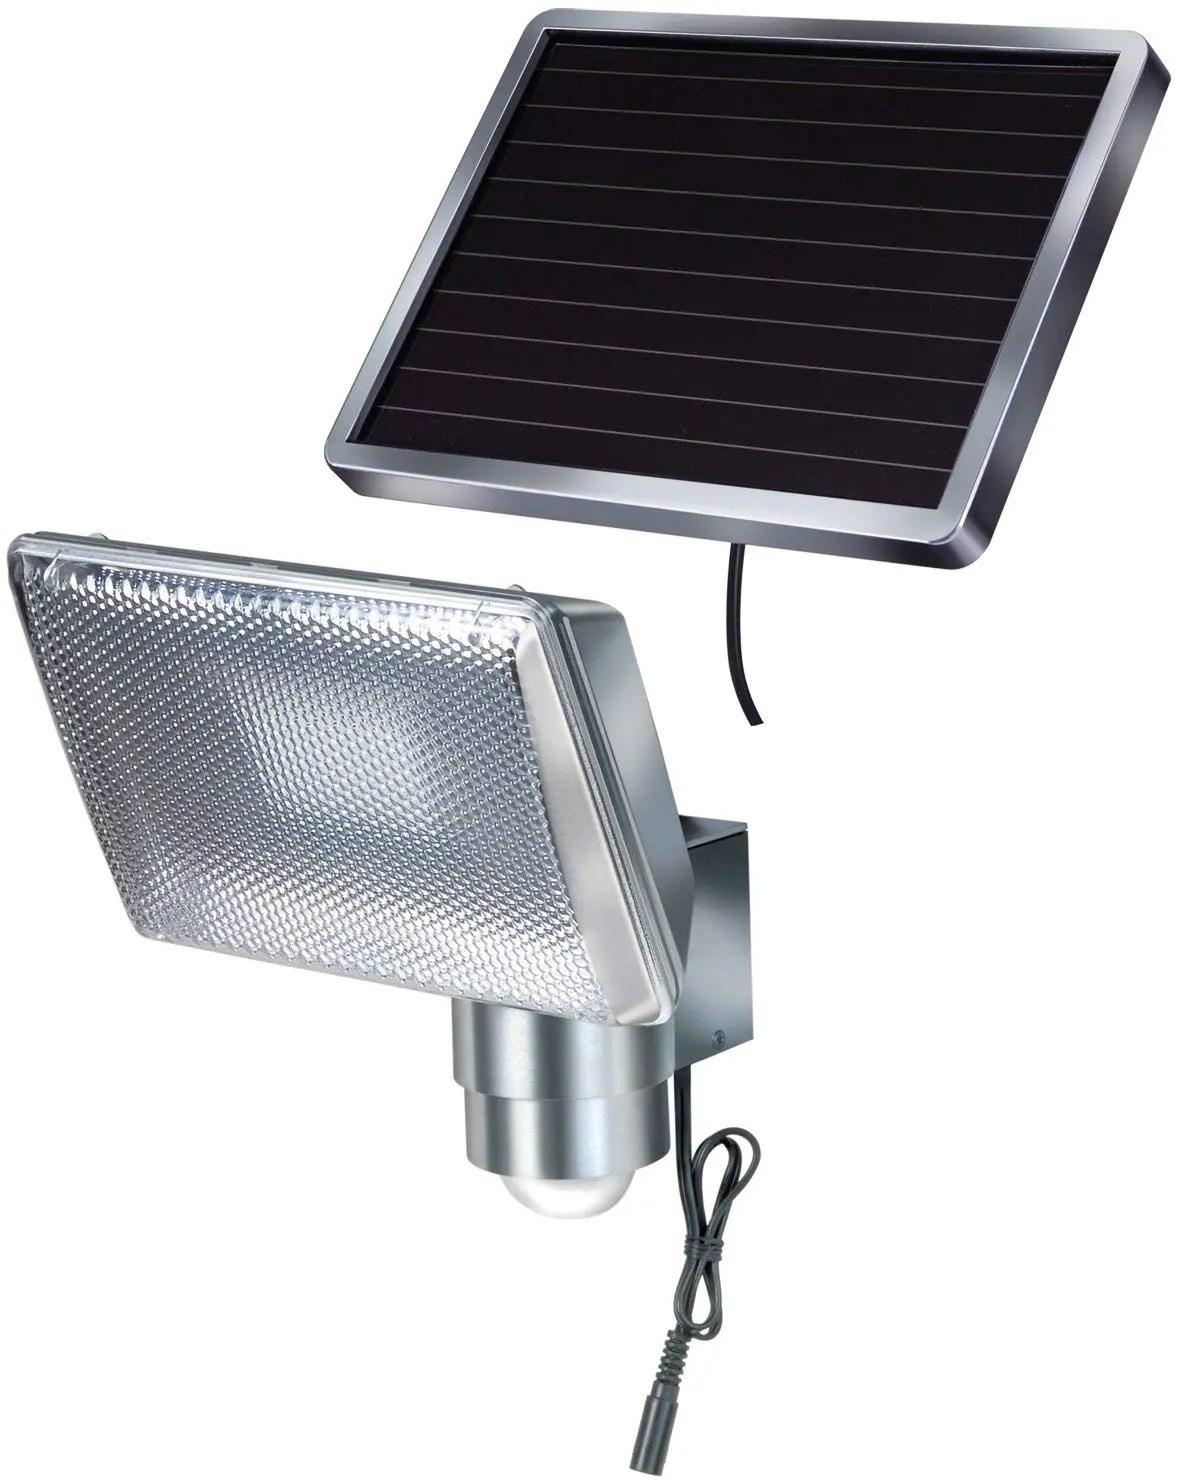 Carport Beleuchtung Kaufen Carport Bausatz Kaufen De